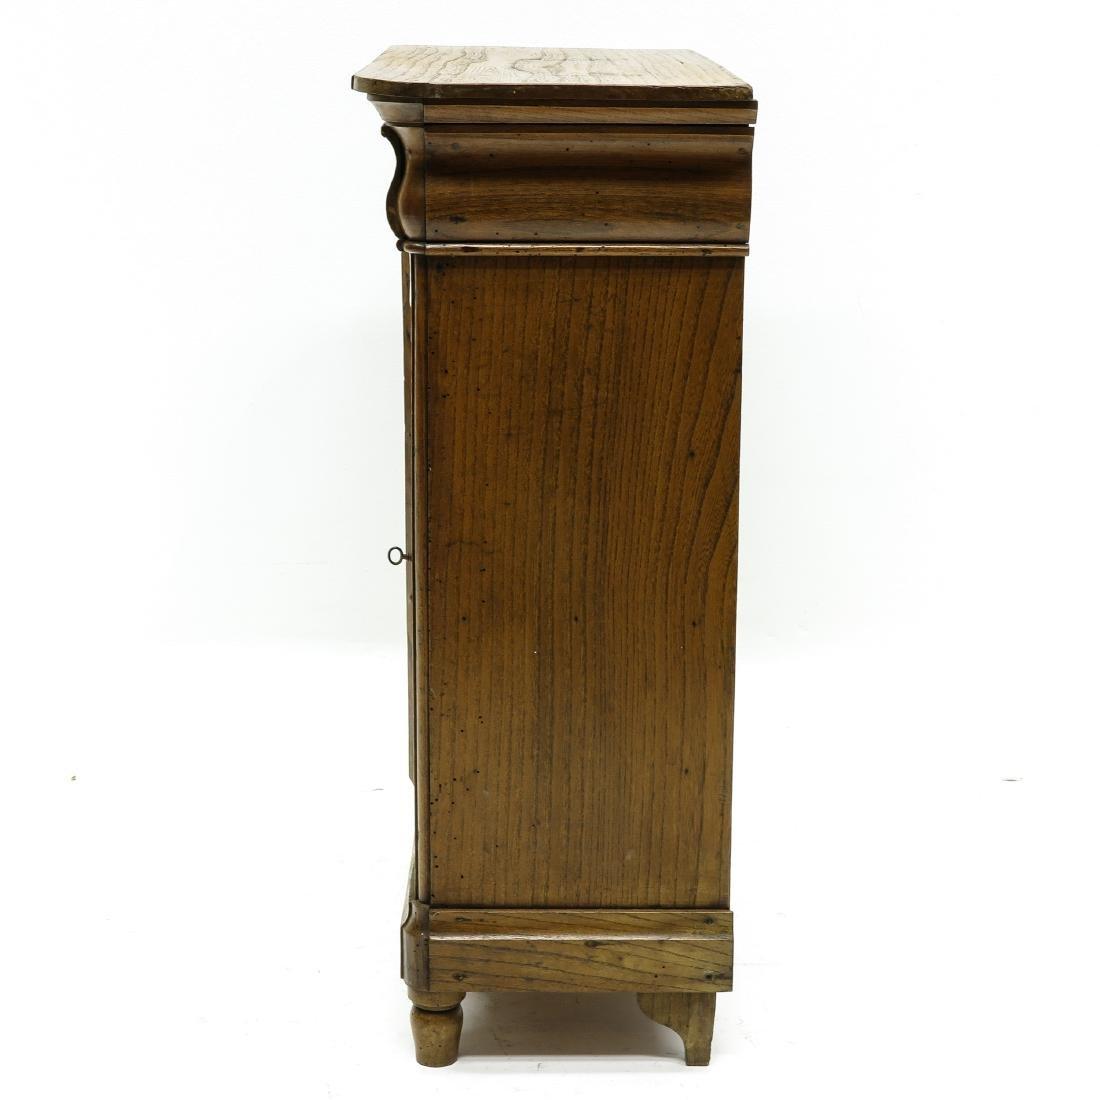 A Miniature Biedermeier Cabinet - 3